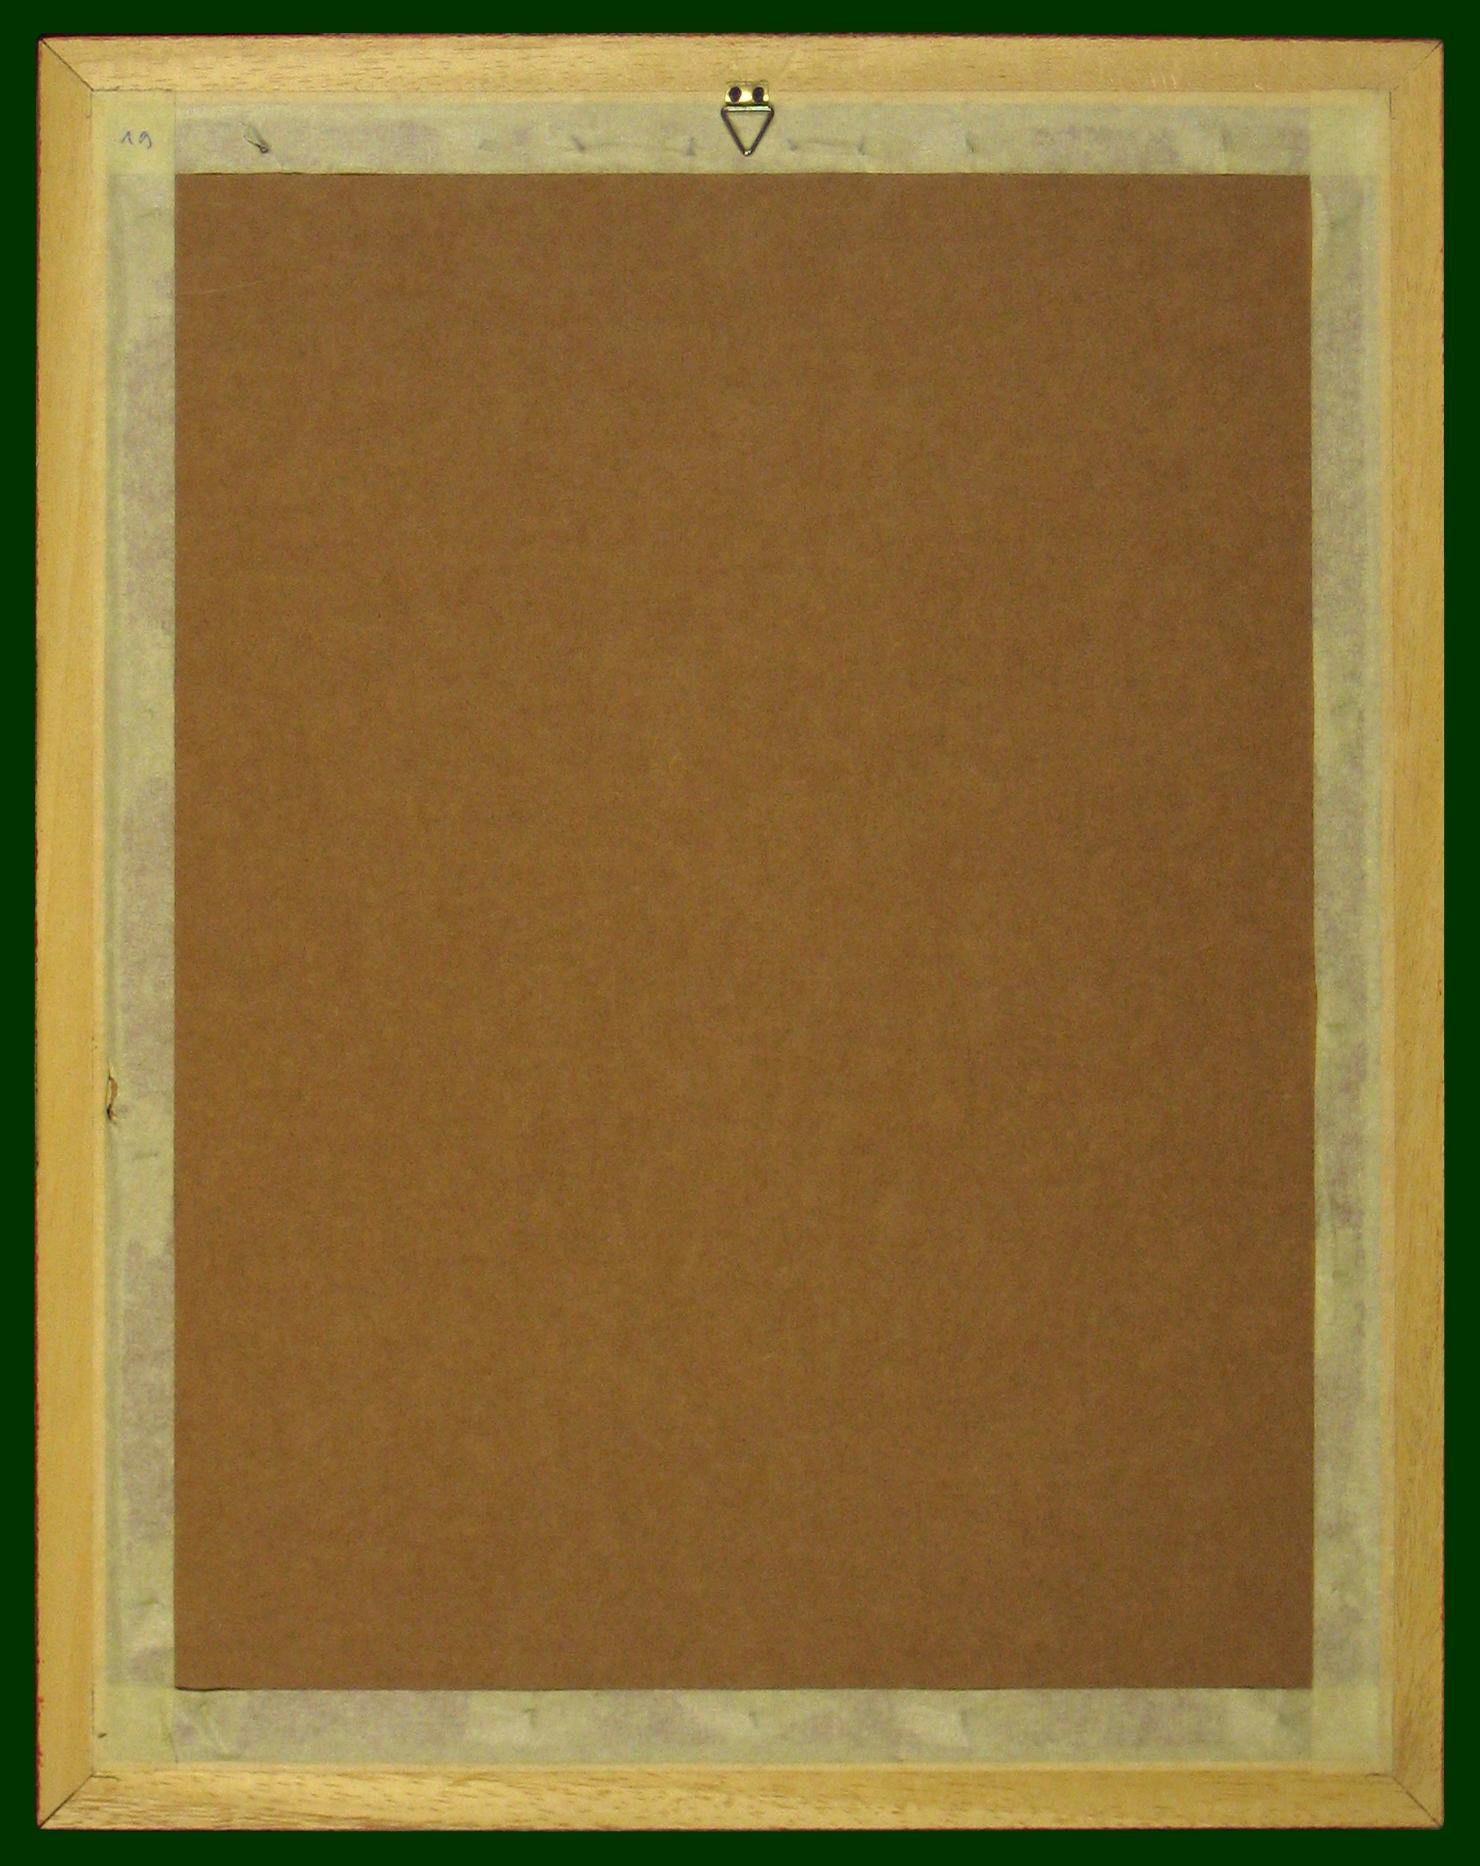 102-14h_t.jpg (1480�1866)